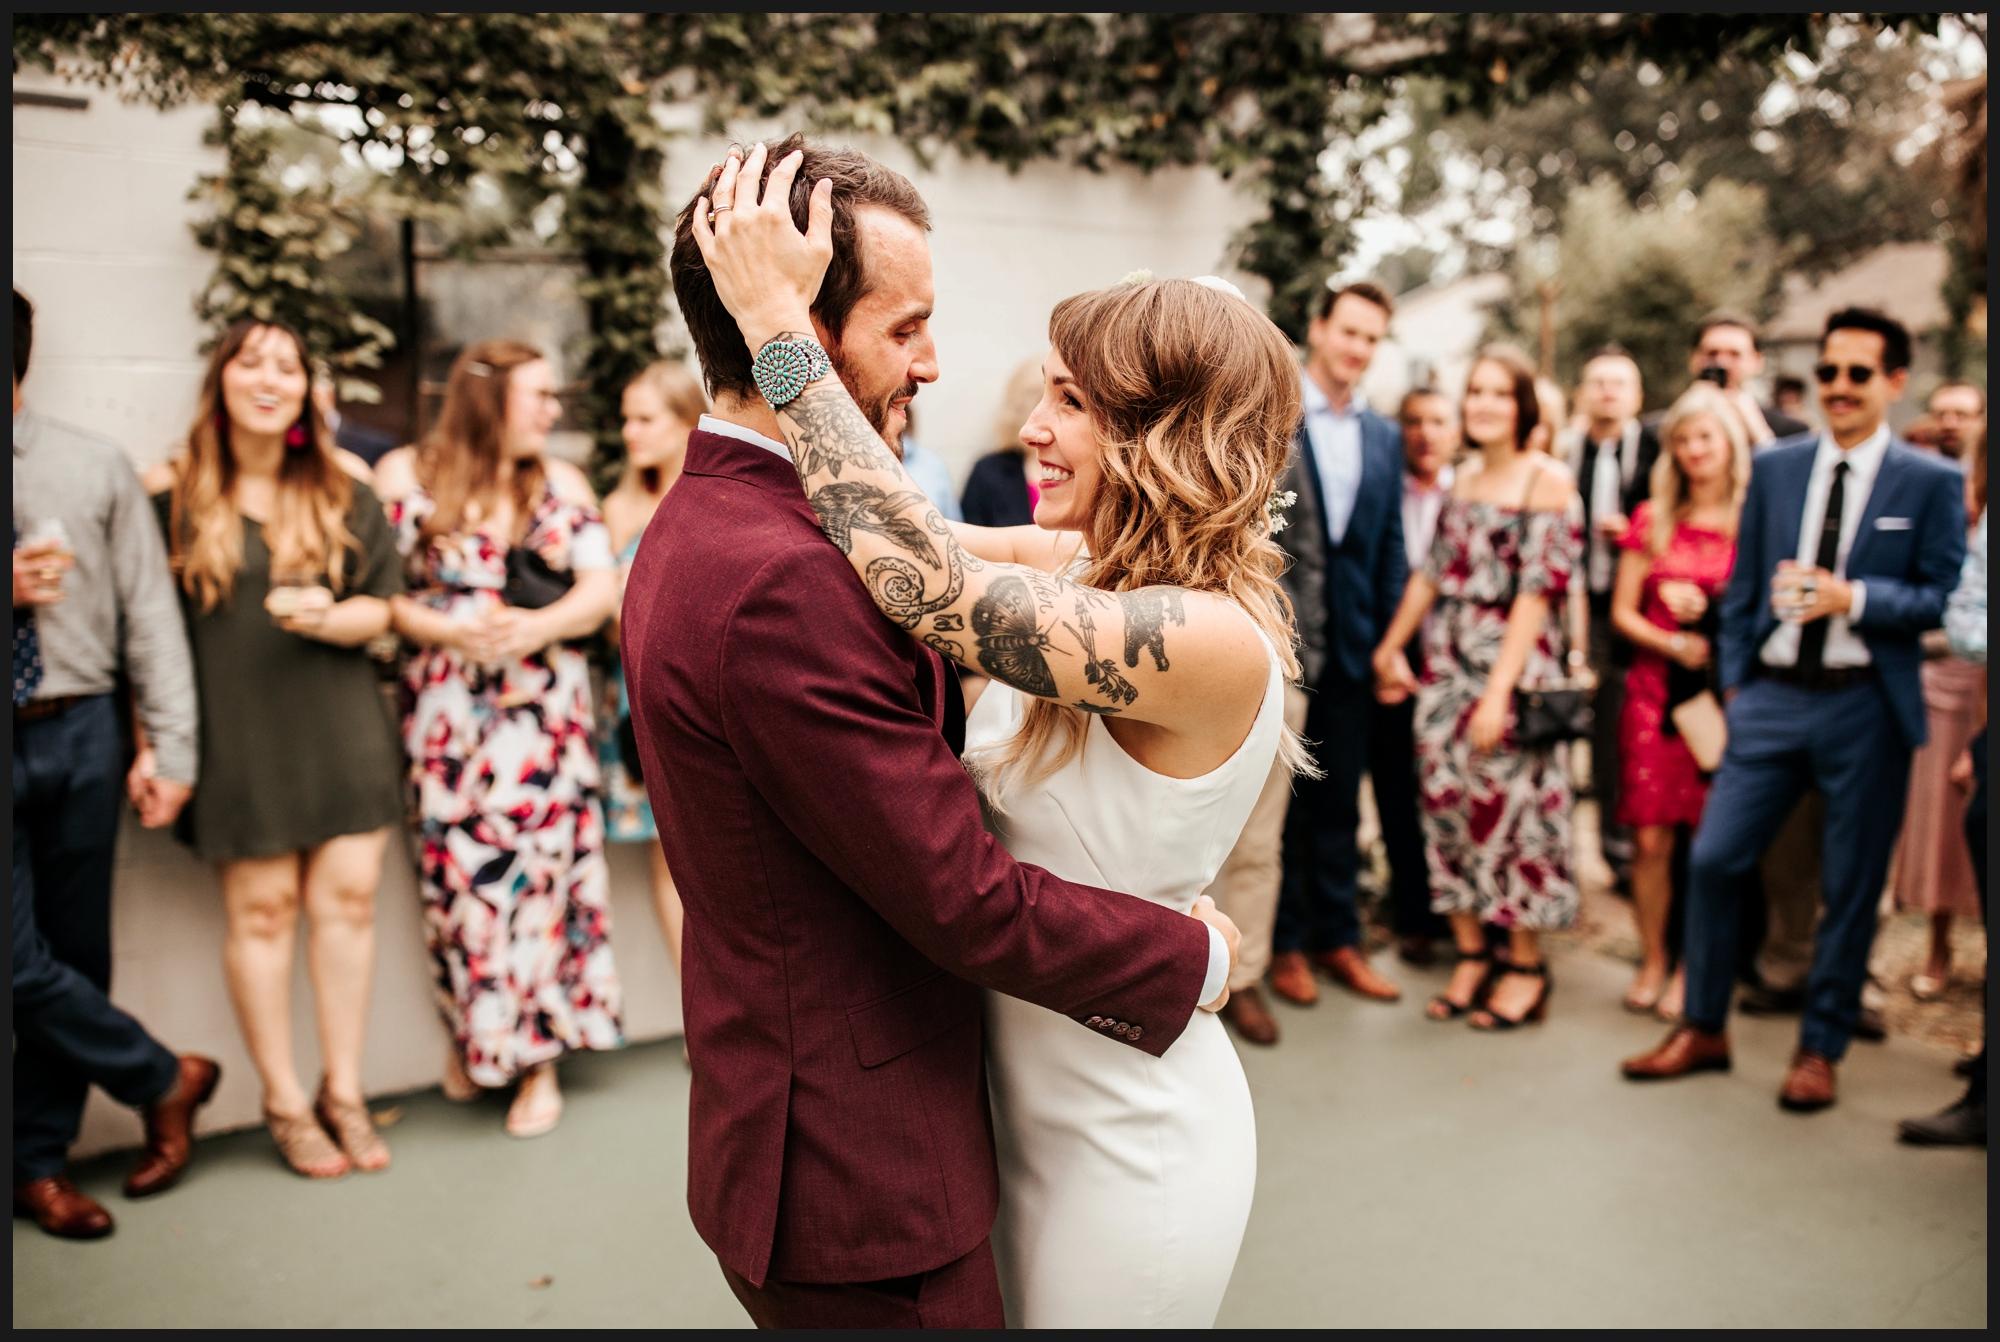 Orlando-Wedding-Photographer-destination-wedding-photographer-florida-wedding-photographer-bohemian-wedding-photographer_2032.jpg